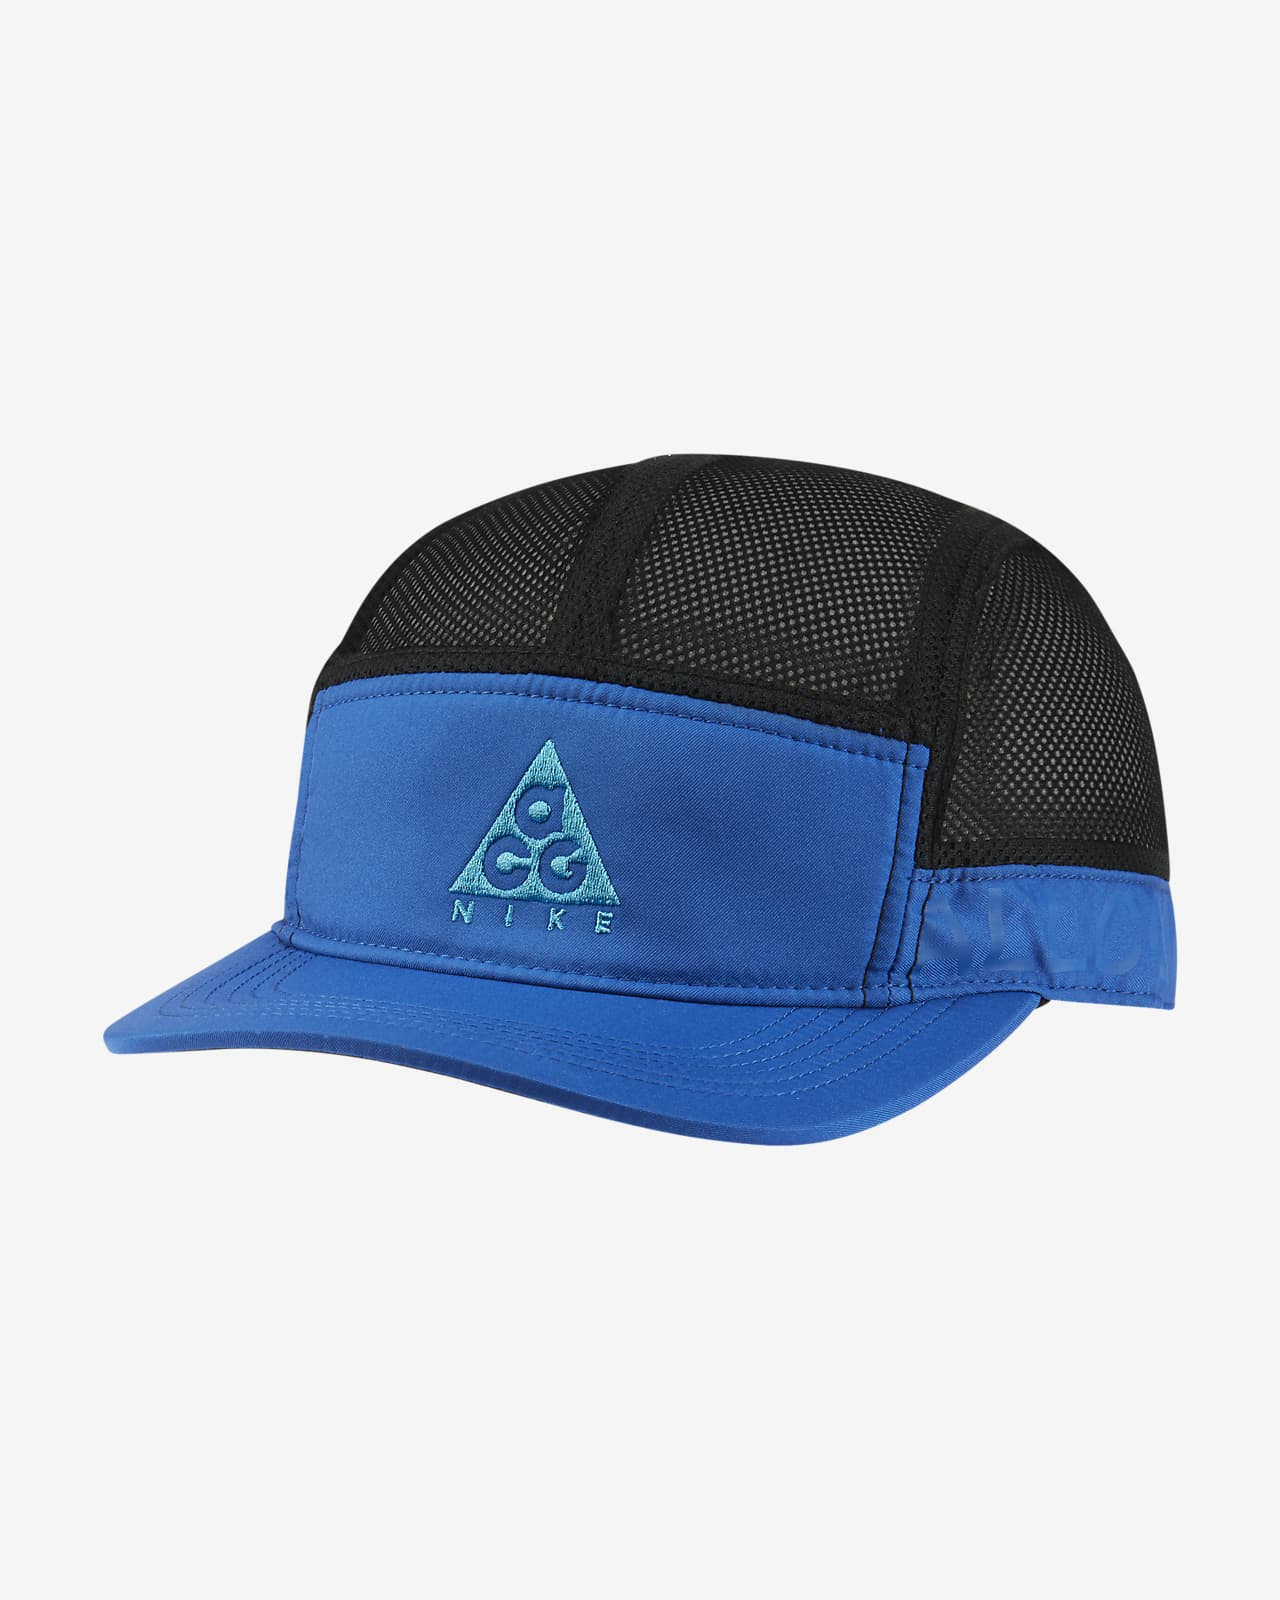 Nike ACG AW84 帽款